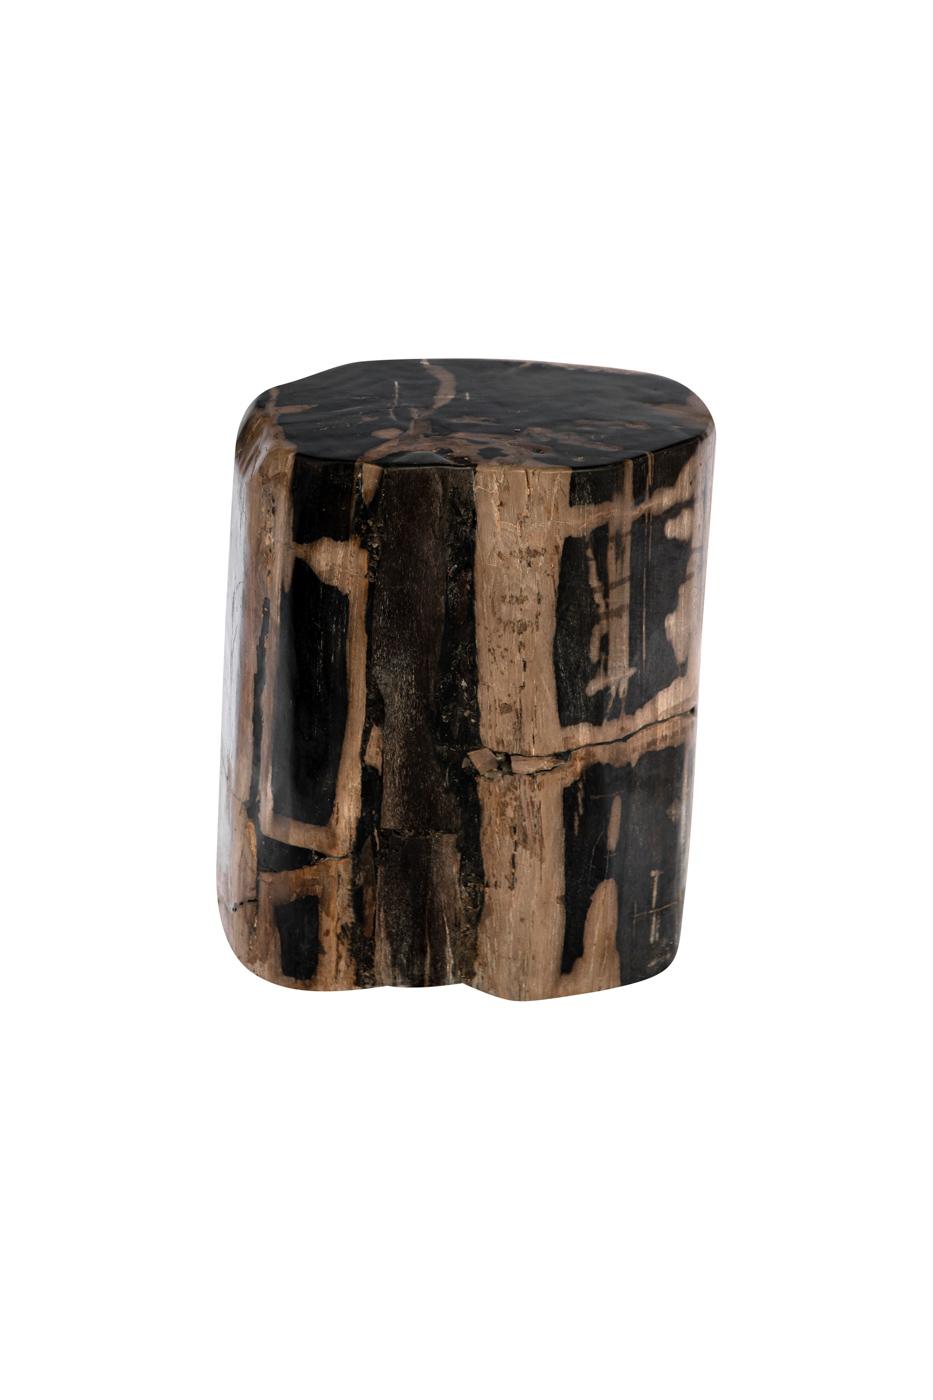 Tronco de madera fosilizada negro-natural